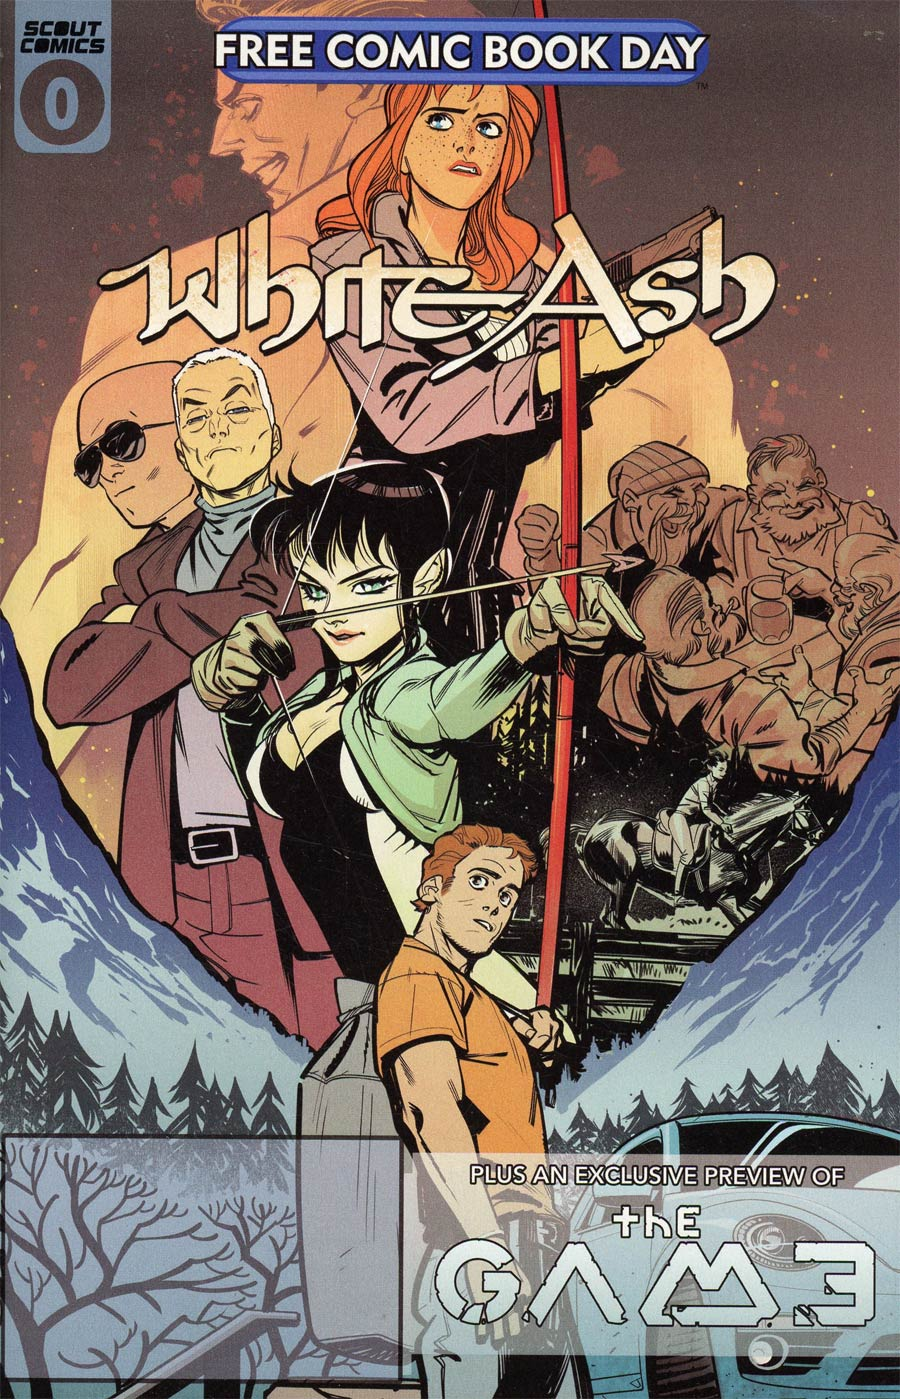 White Ash Season 2 #0 FCBD 2021 Edition